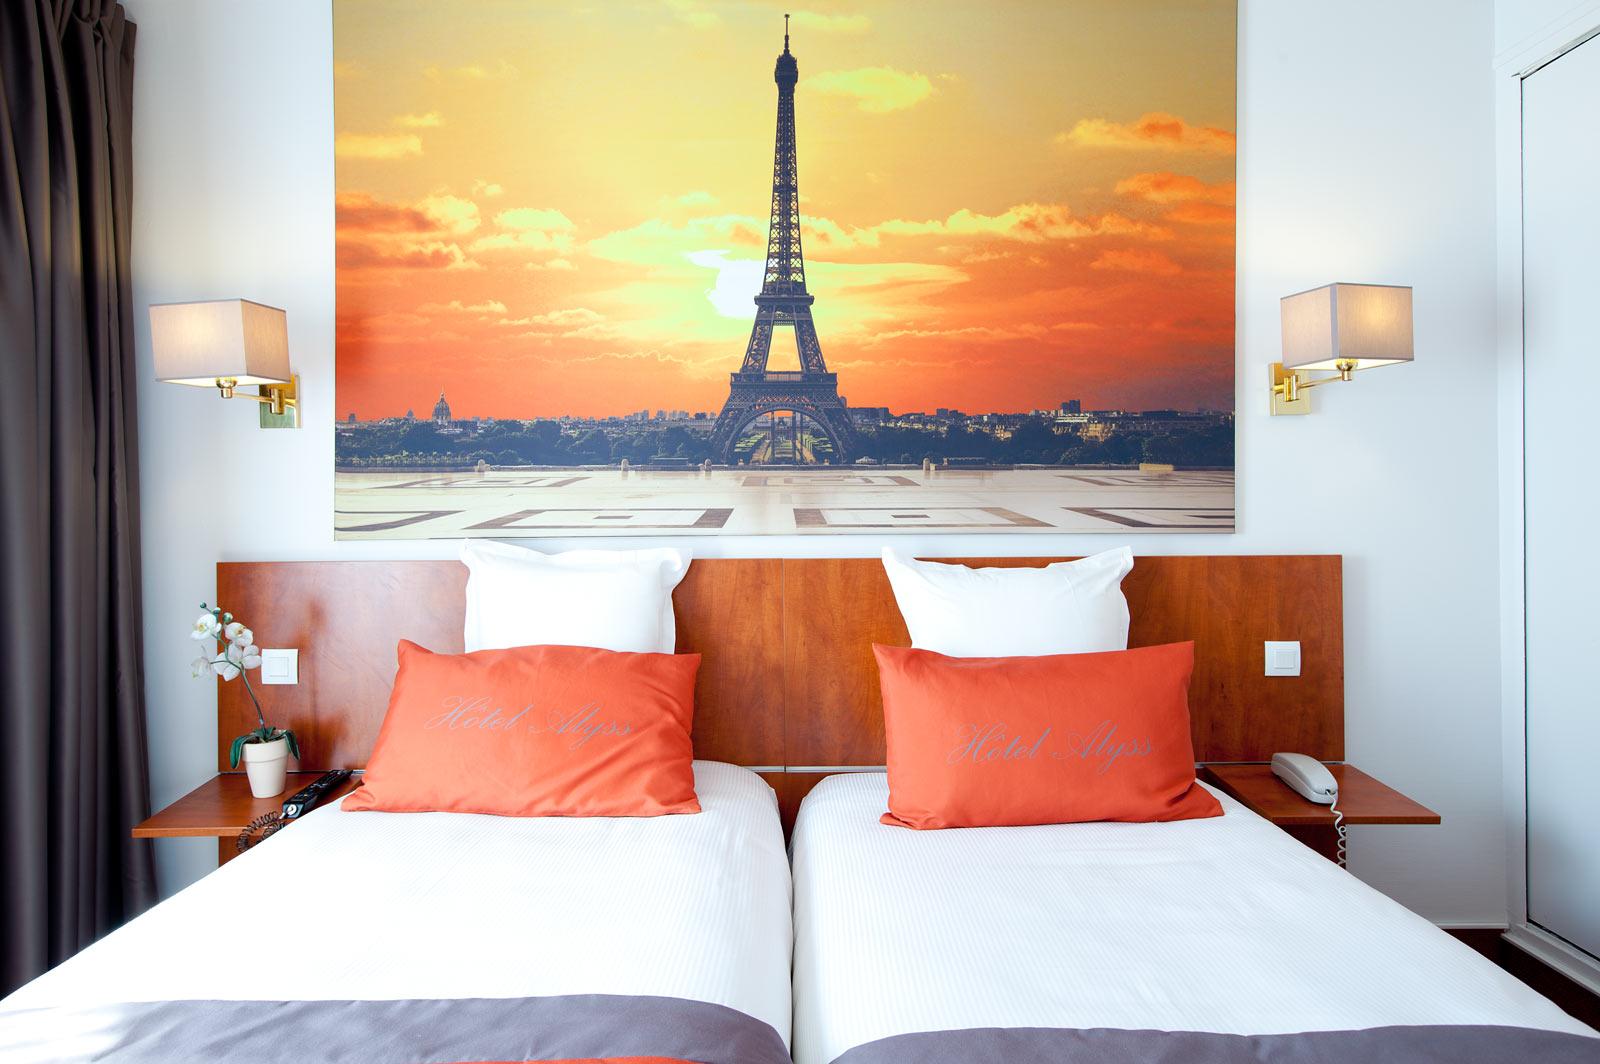 Hotel Saphir Grenelle Photos Hotel Alyss Saphir Cambronne Eiffel In Paris